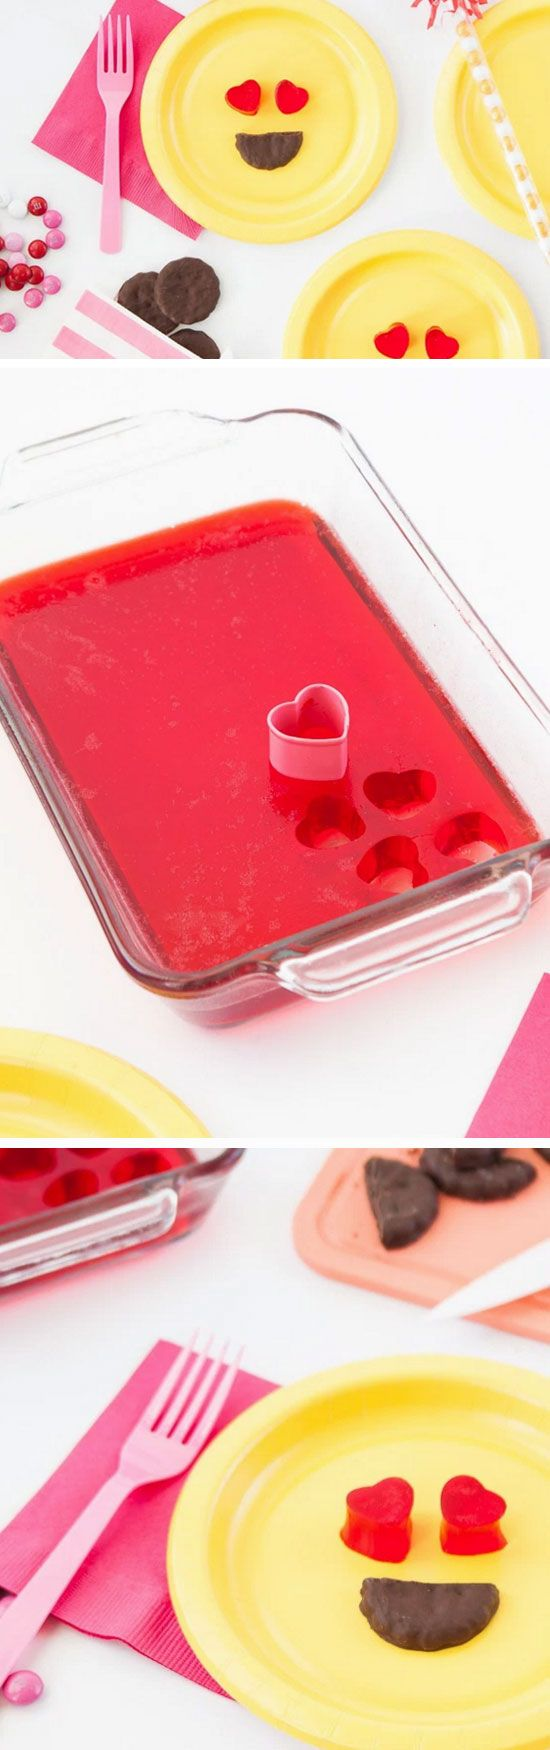 Heart Eye Emoji Treats | Sweet 16 Party Ideas for Girls | Easy Valentines Day Treats for Kids